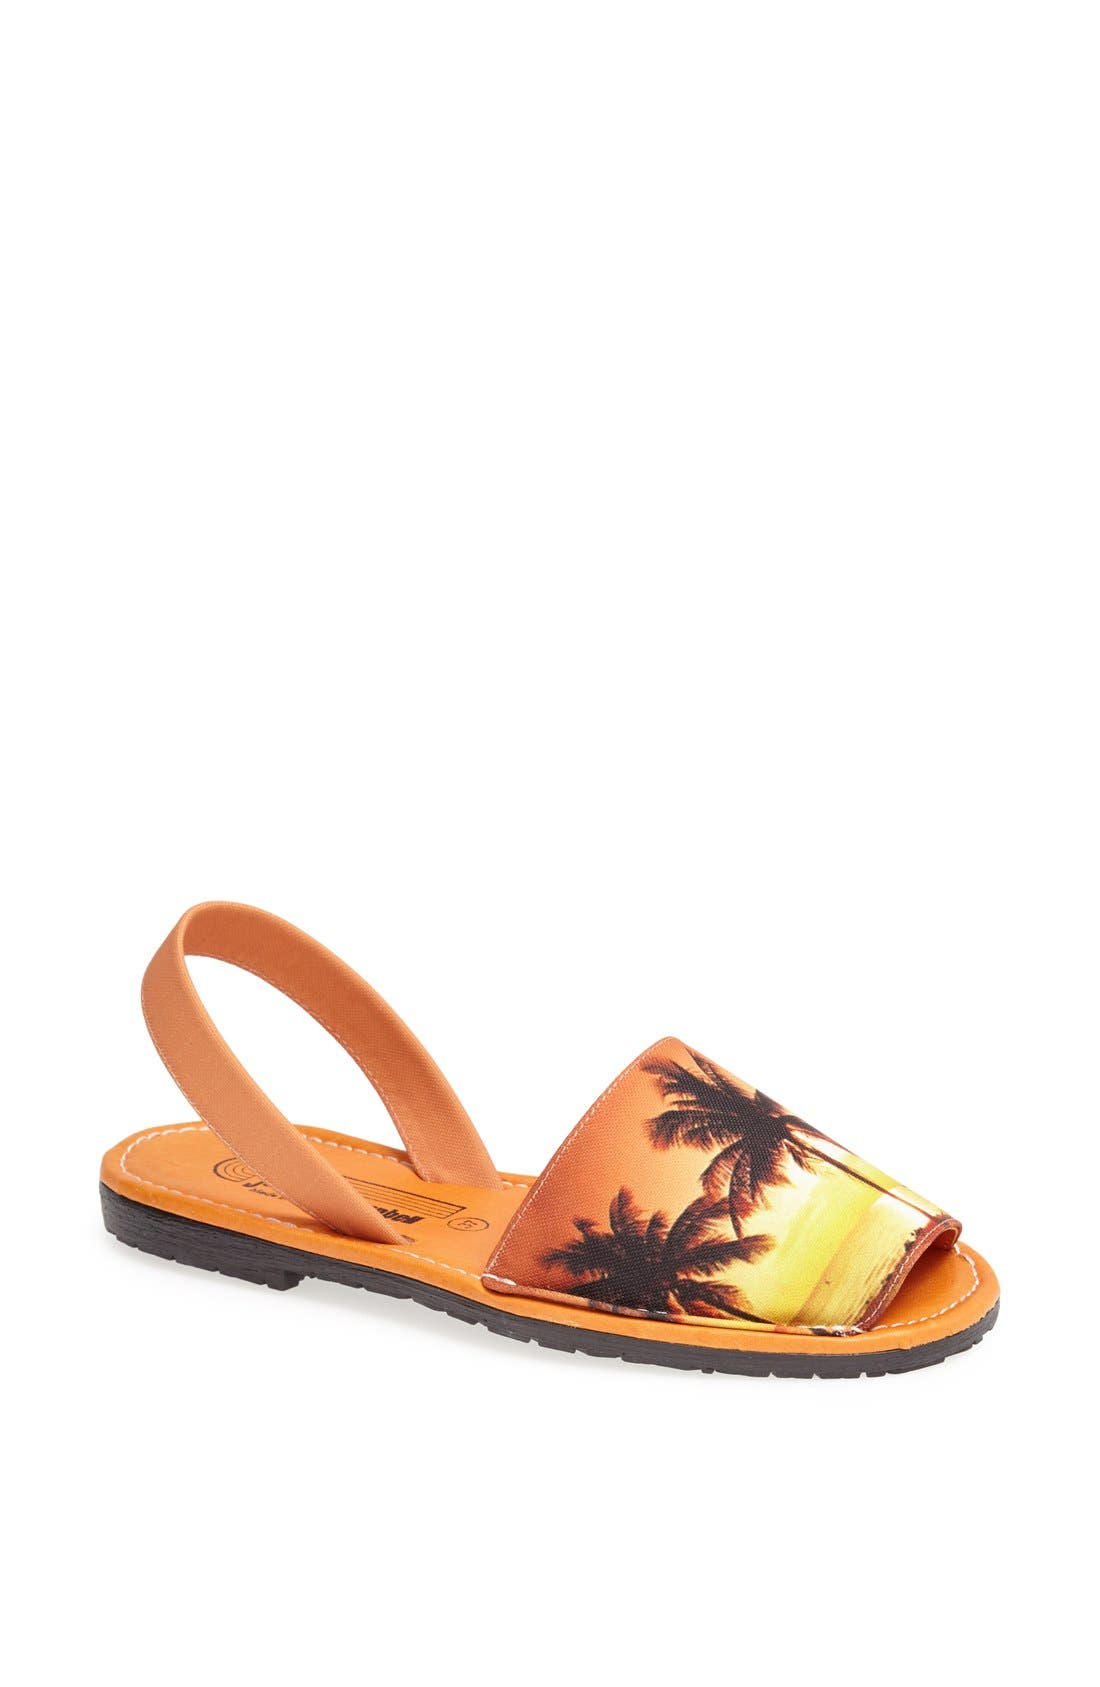 Main Image - Jeffrey Campbell 'Ibiza' Sandal